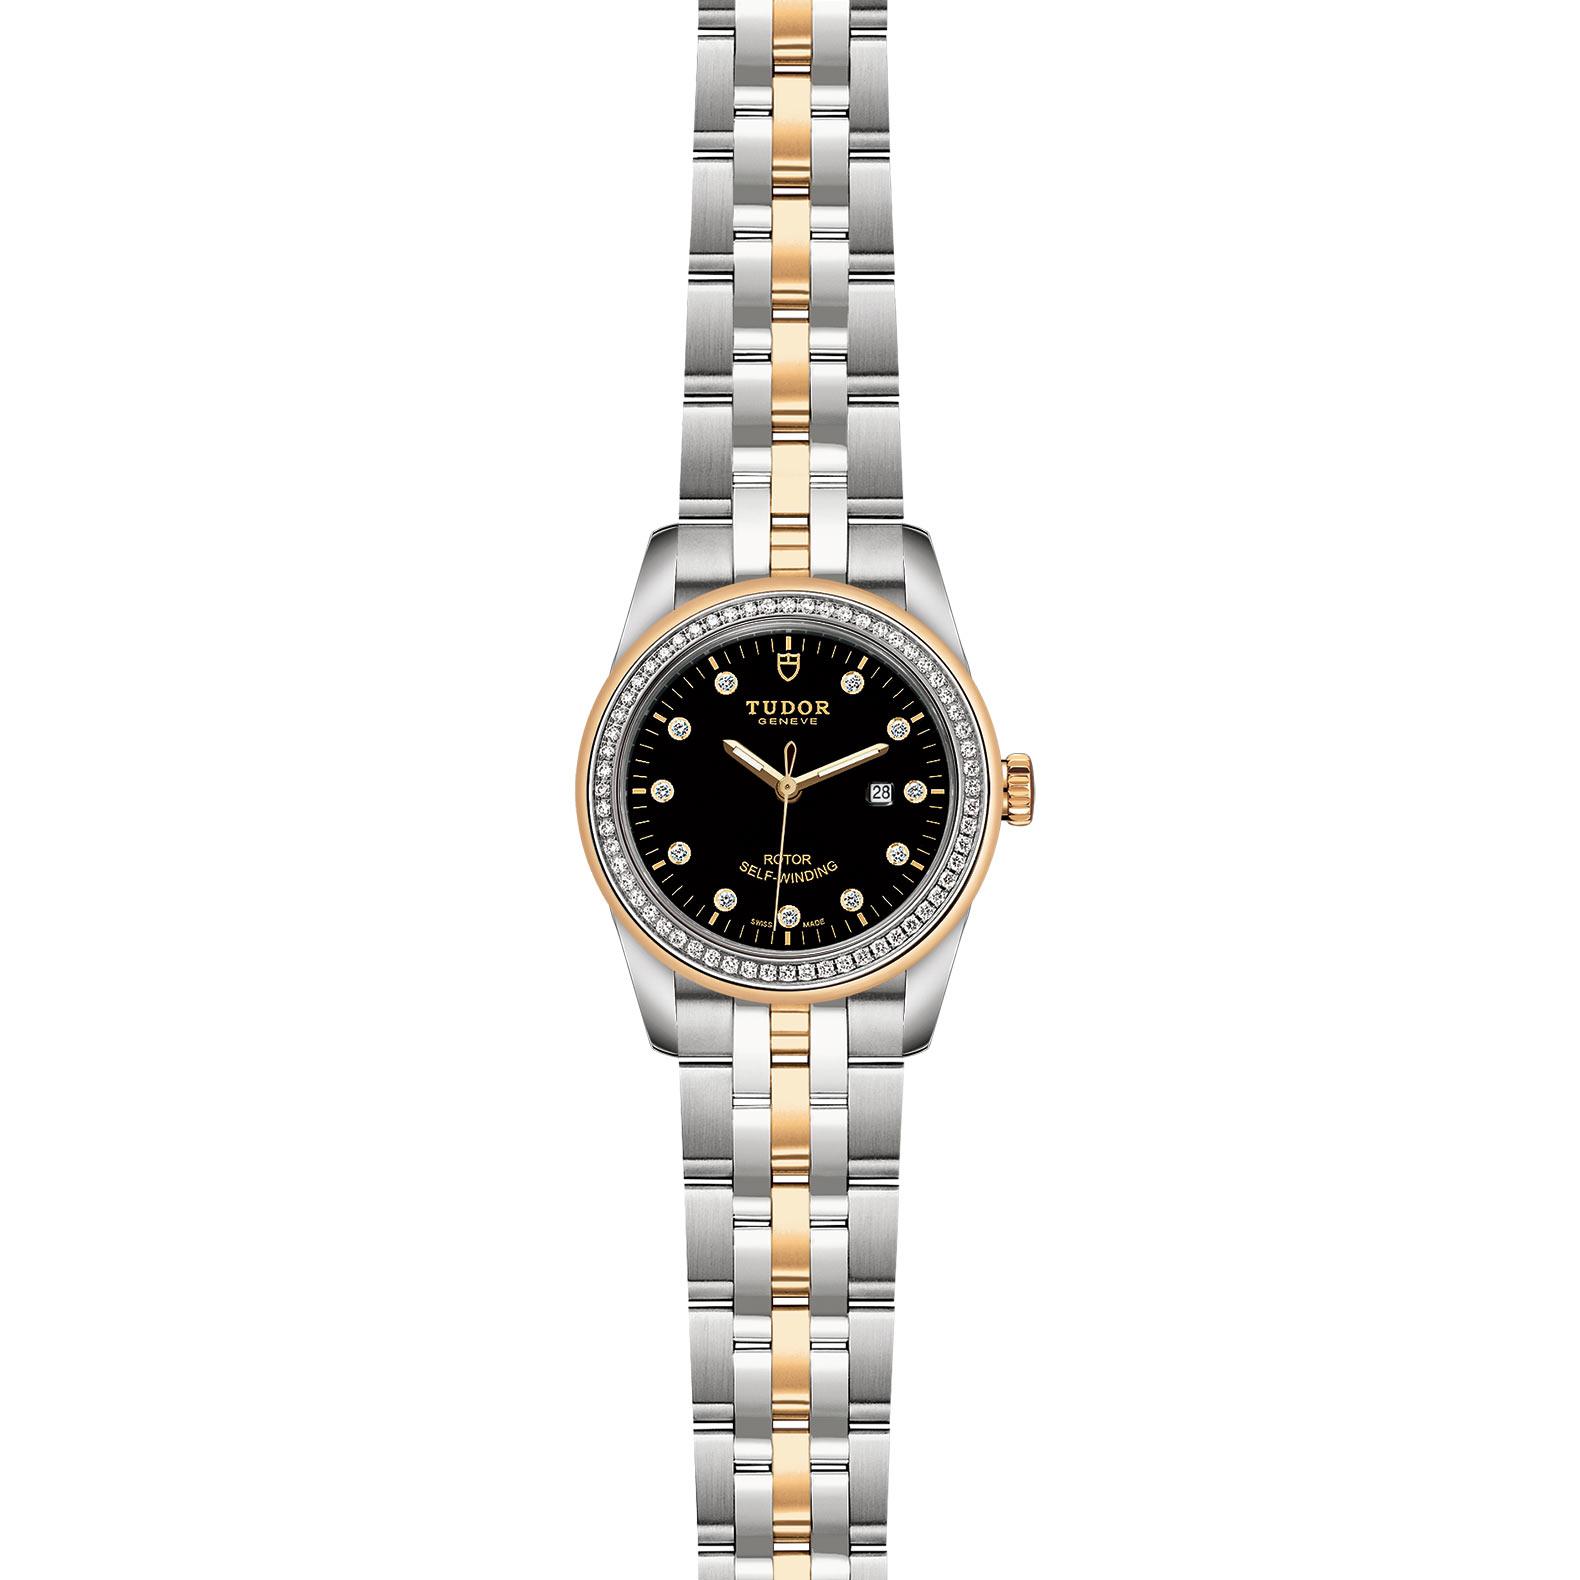 TUDOR Glamour Date M53023 0017 Frontfacing